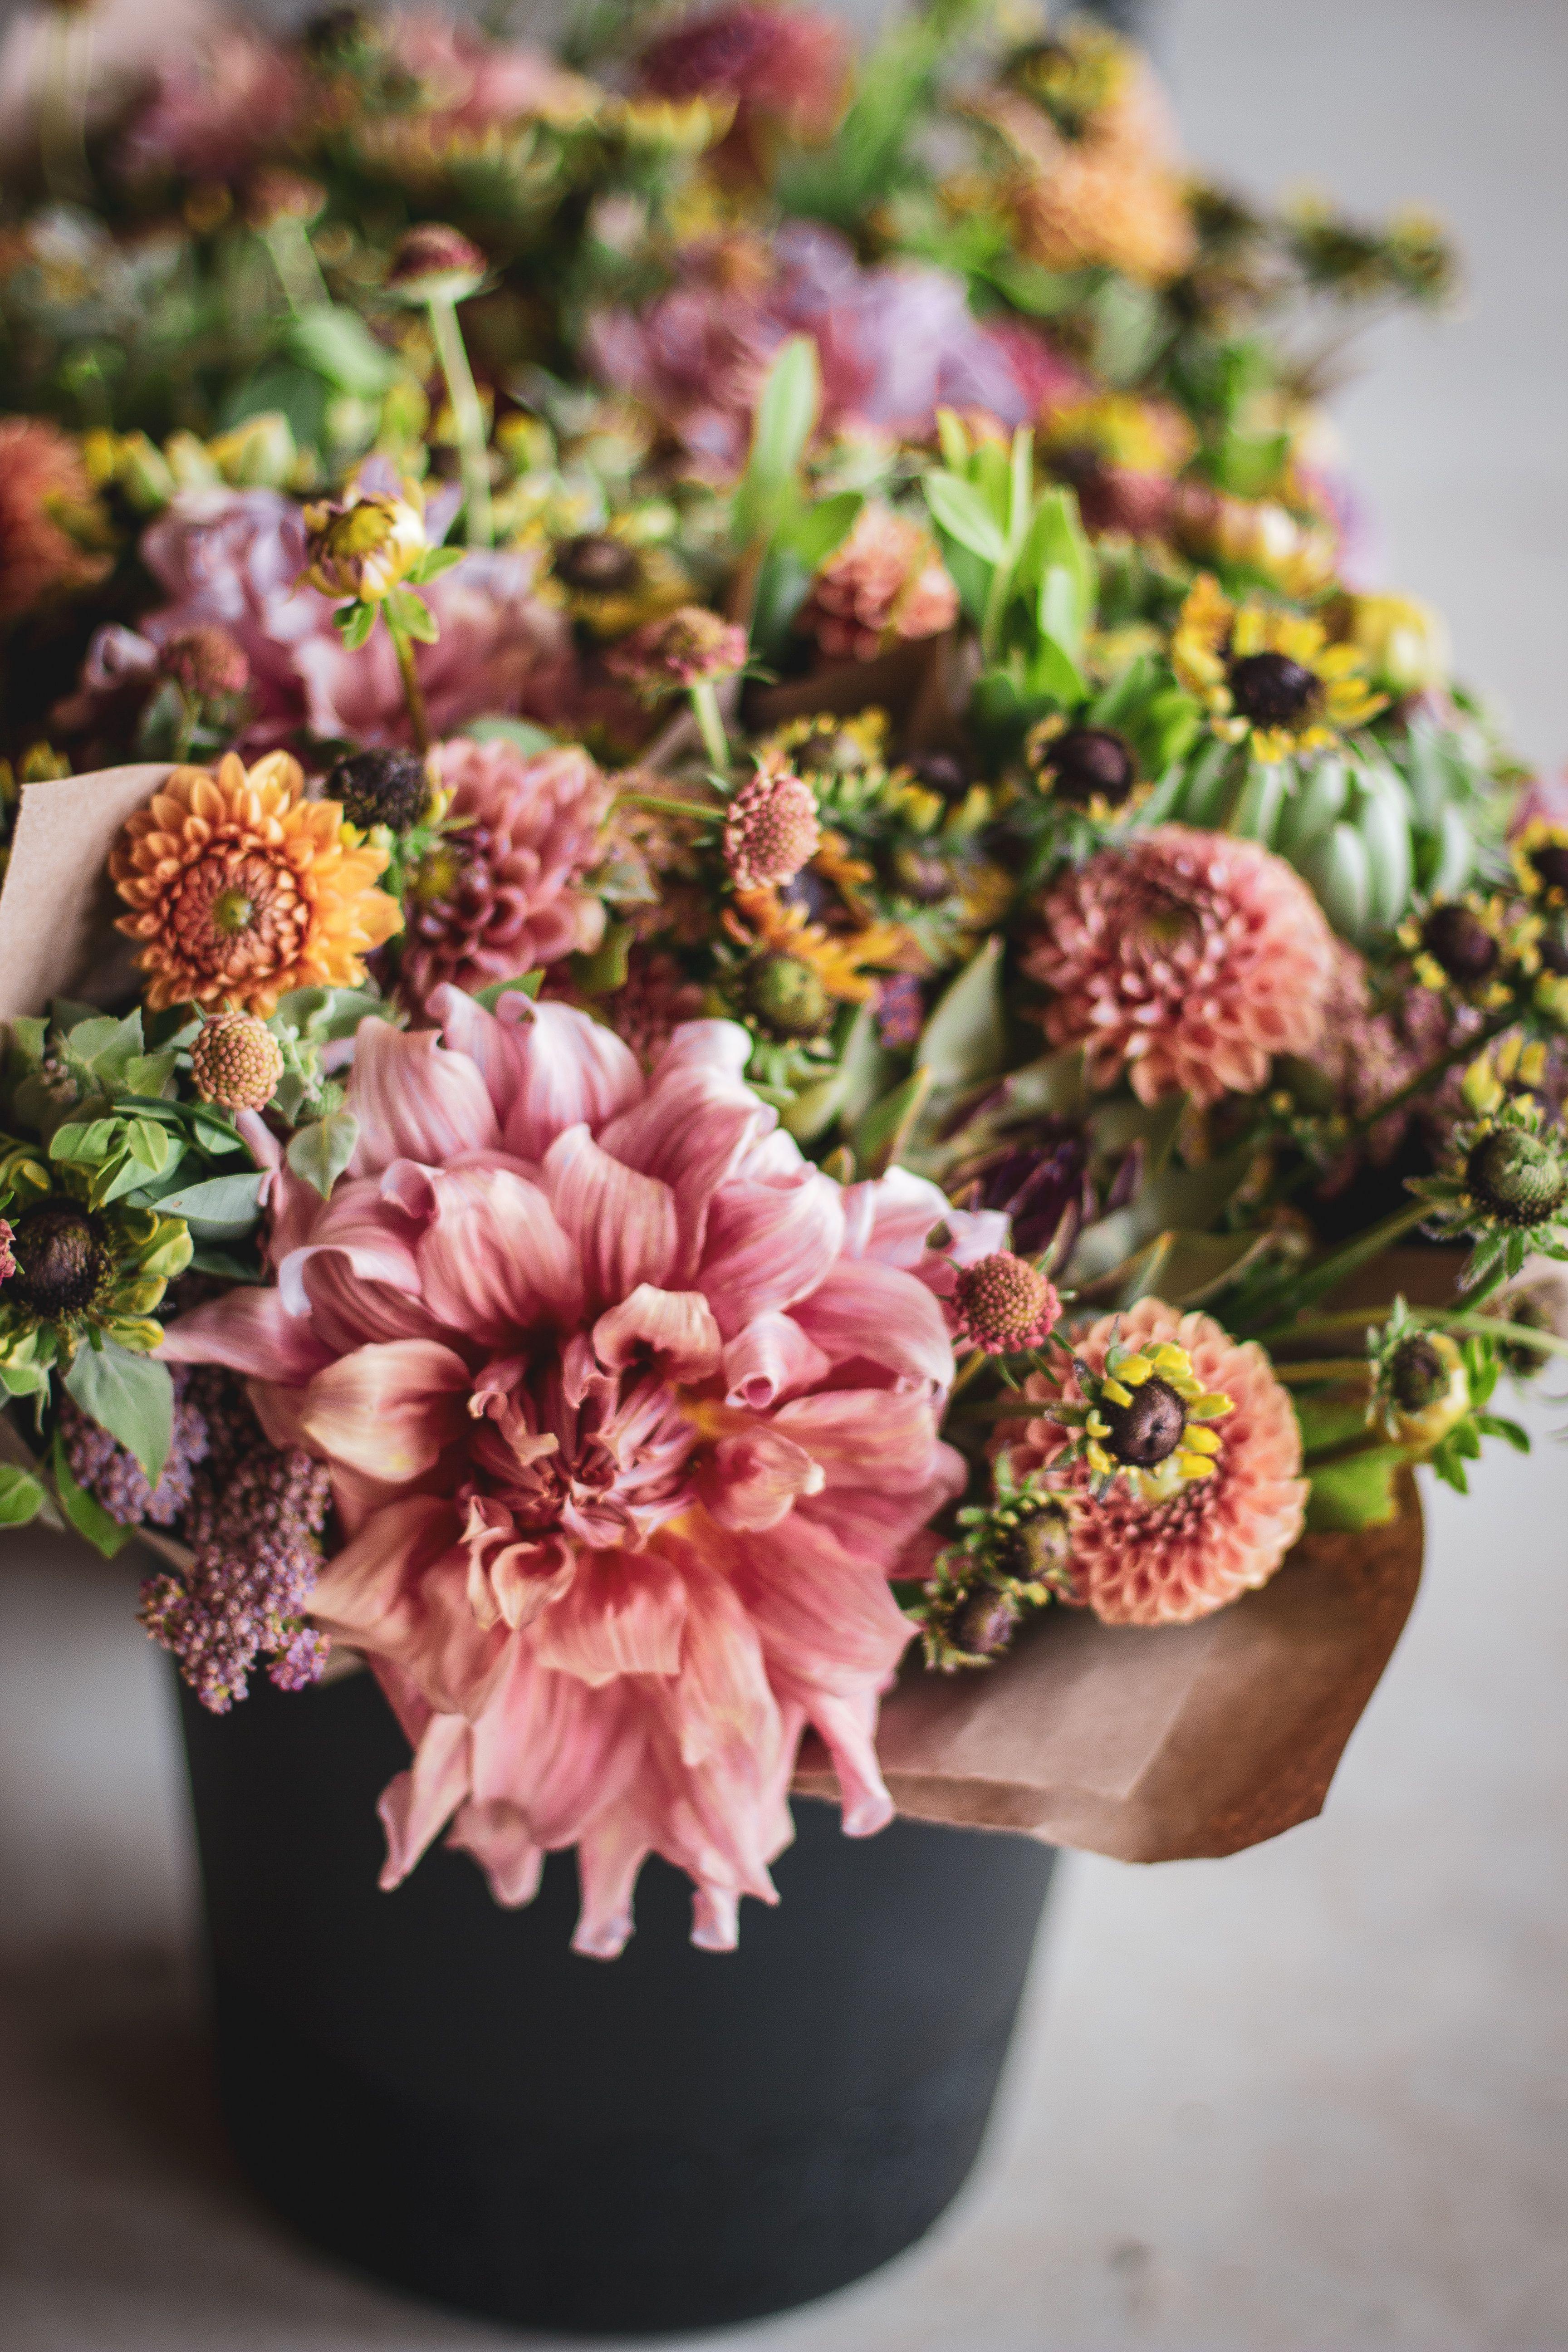 Buckets of flowers at love n fresh flowers a flower farm